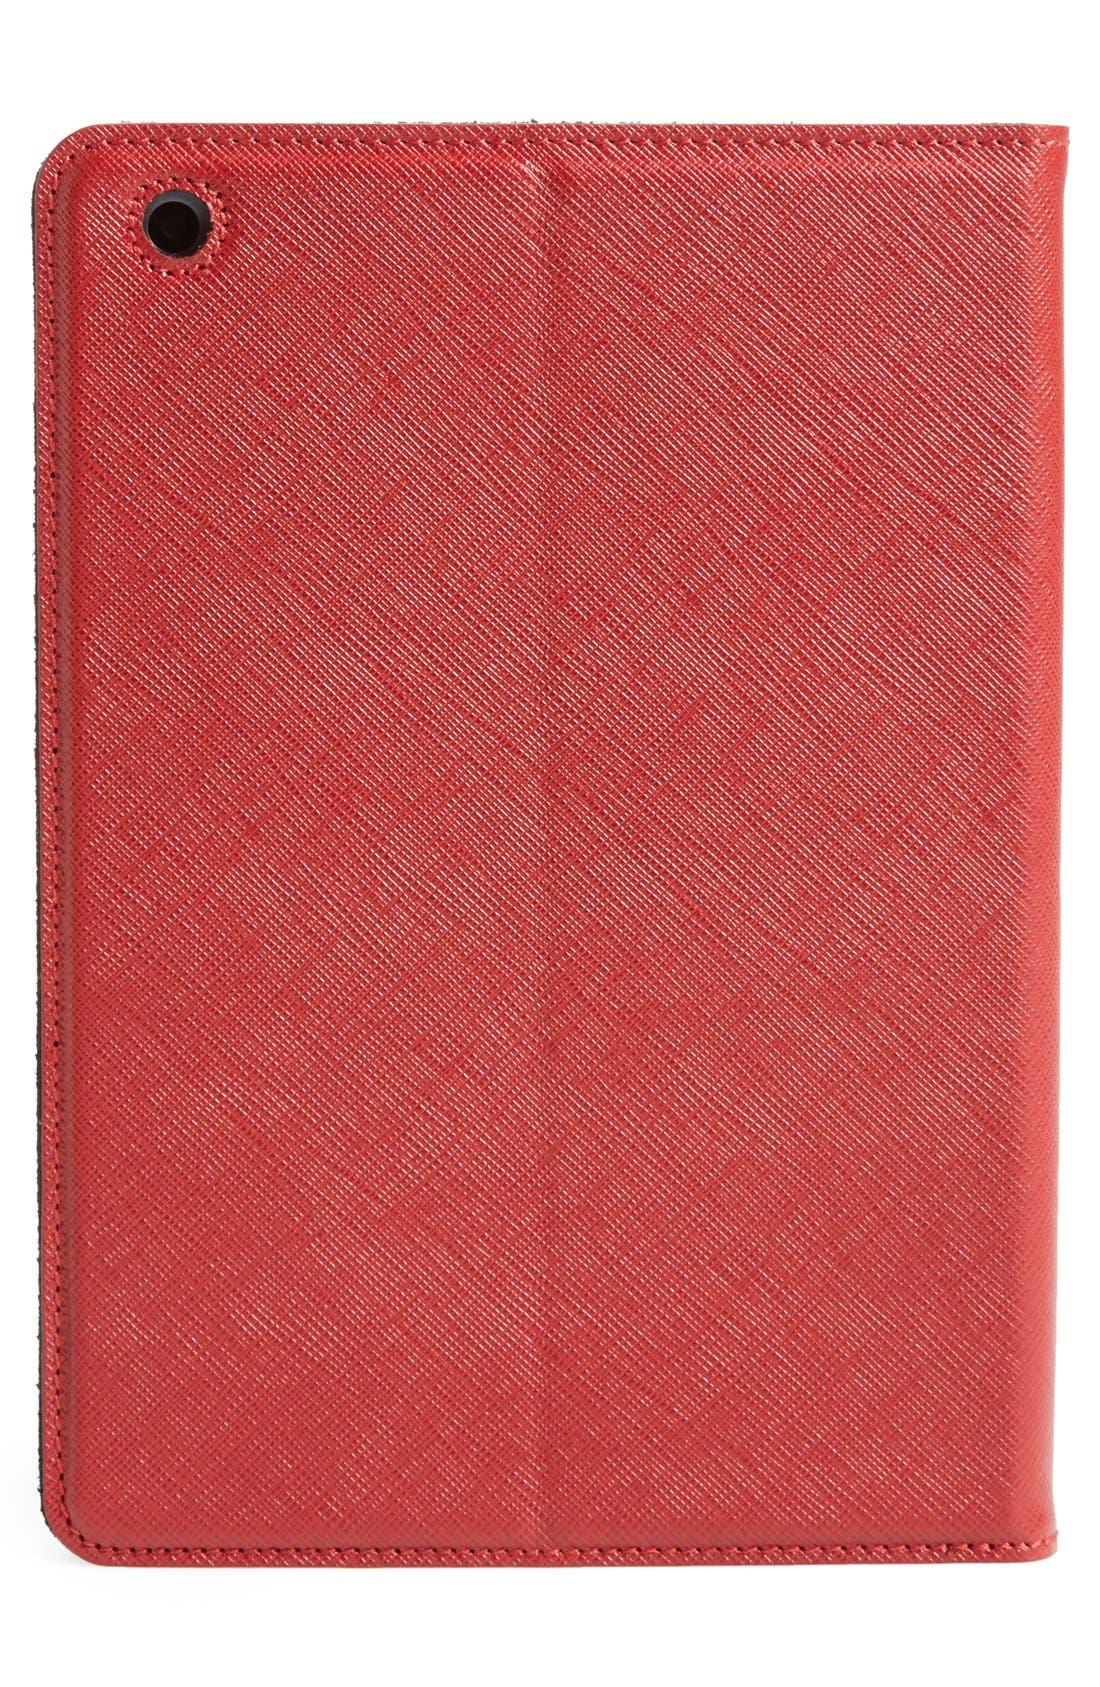 Alternate Image 5  - Salvatore Ferragamo 'Gancini' Leather iPad mini Case